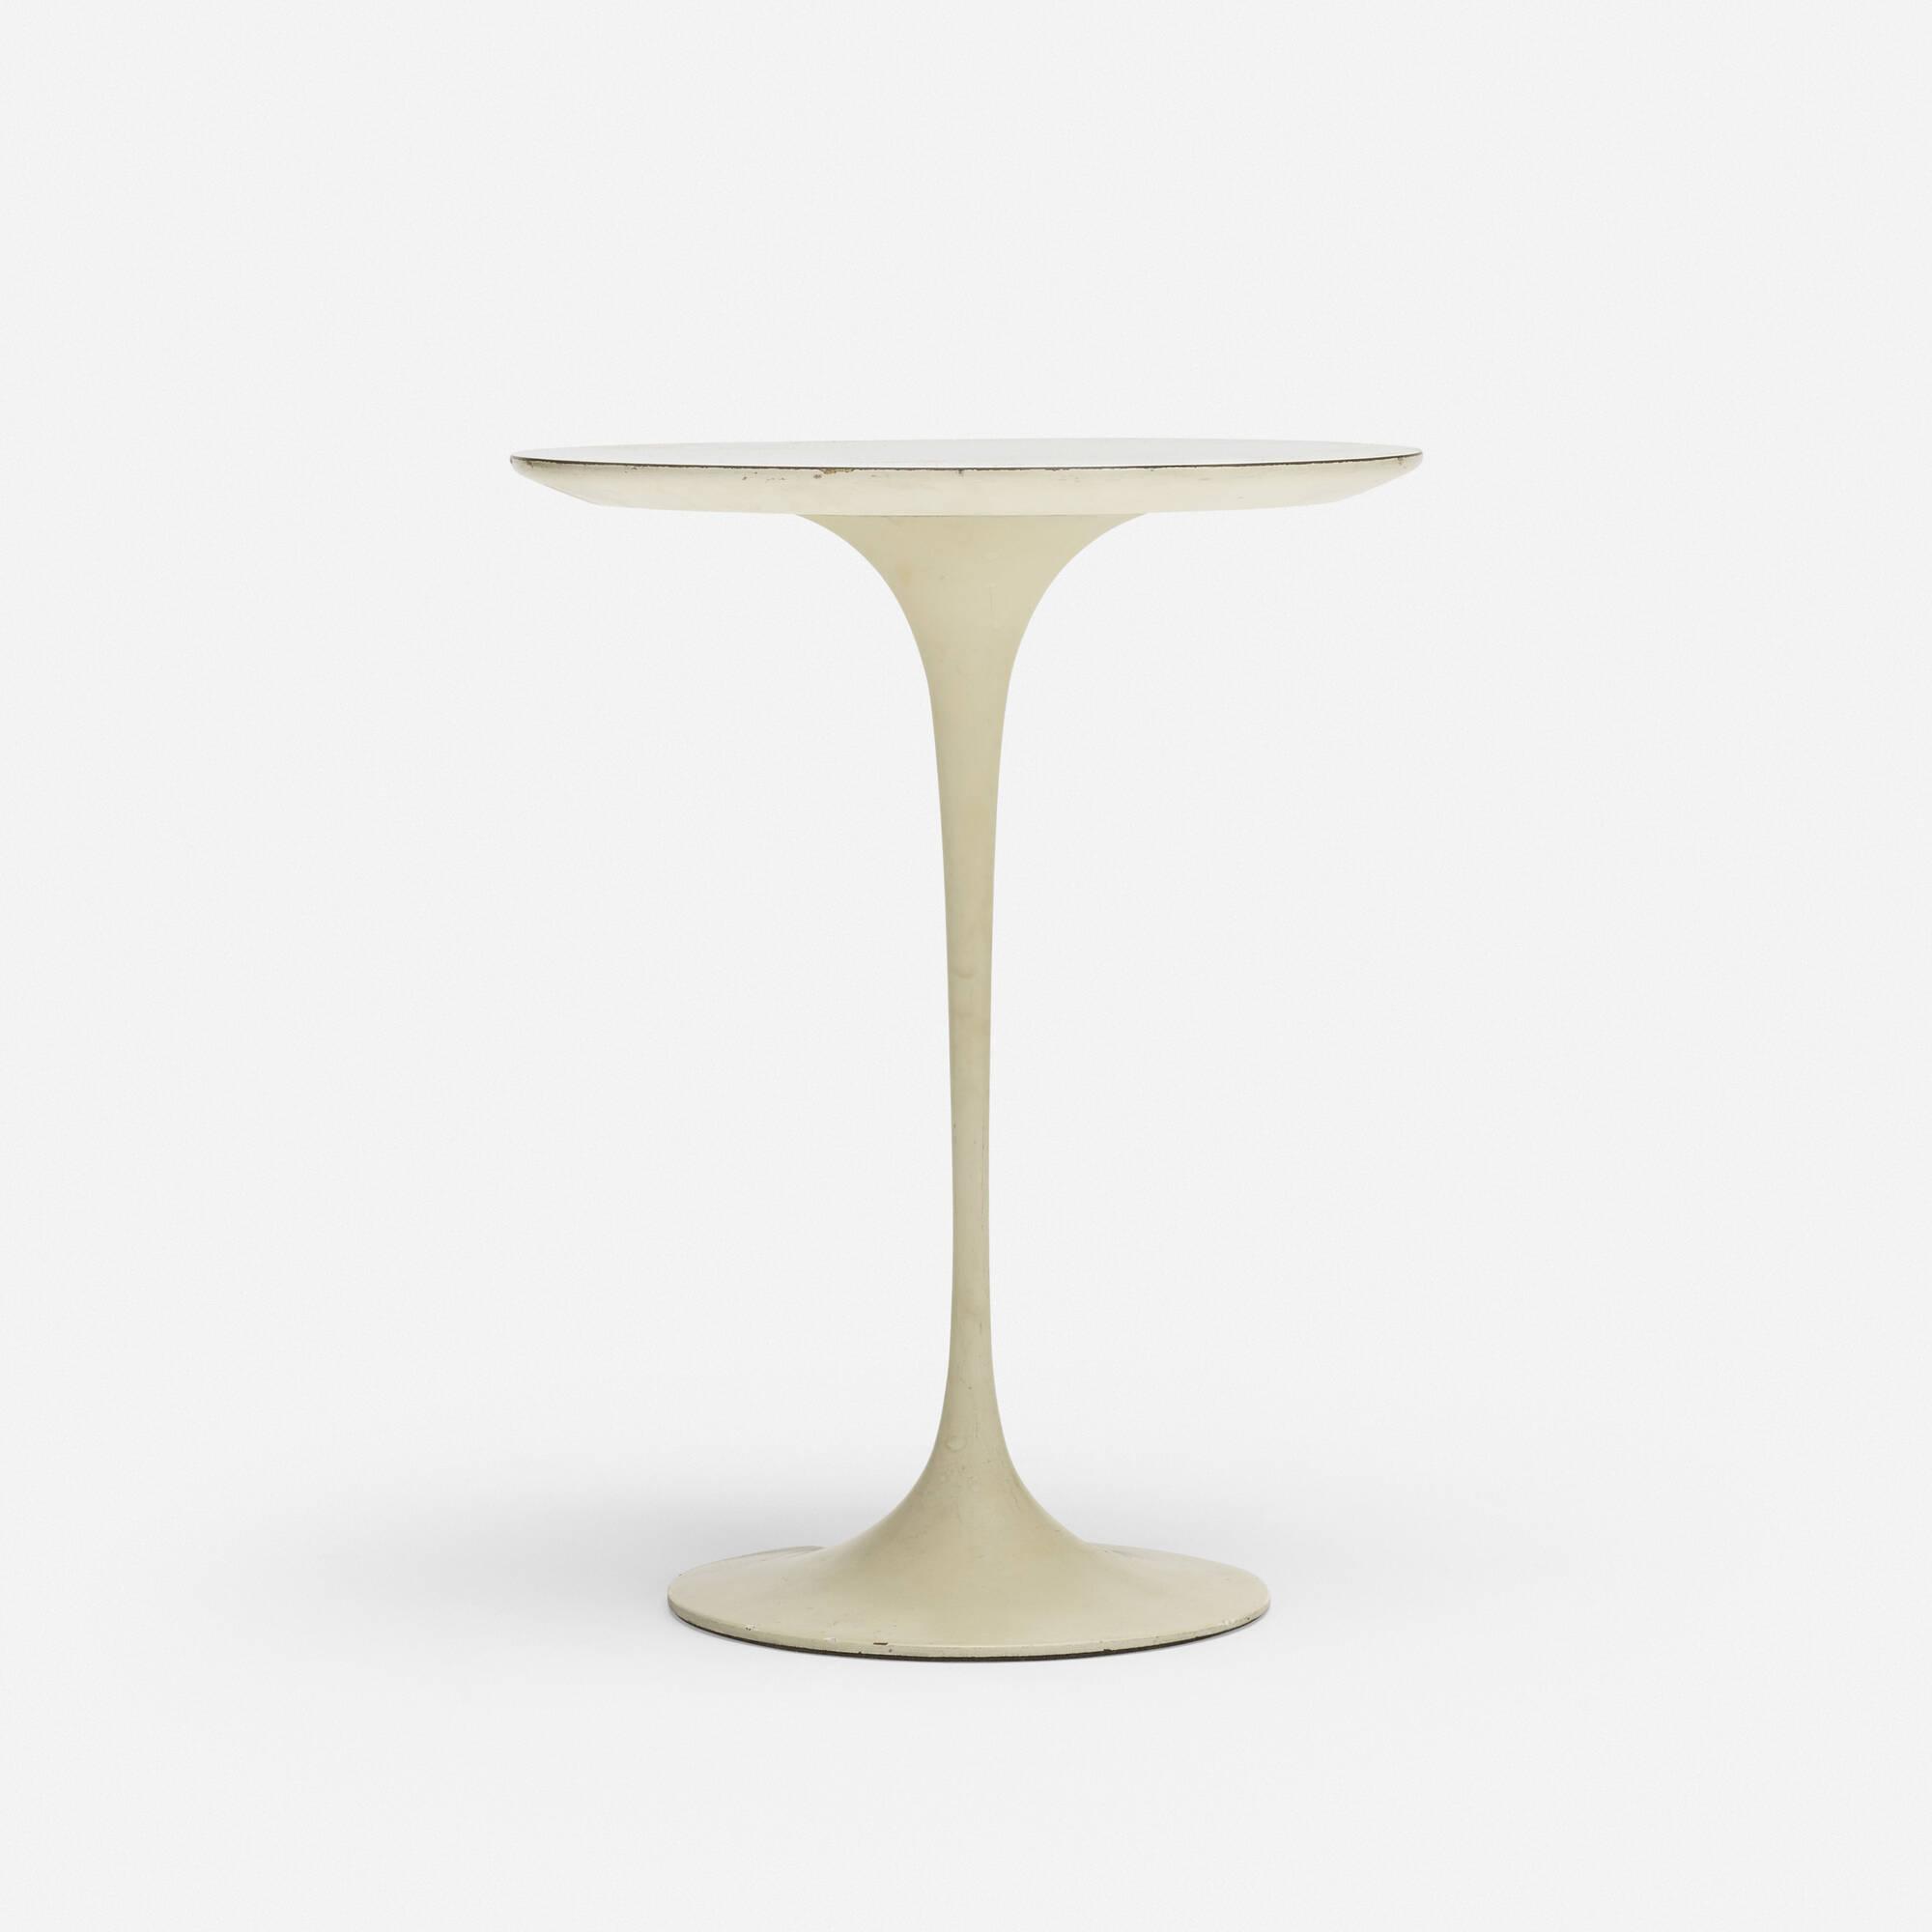 702: Eero Saarinen / side table, model 163 (1 of 1)